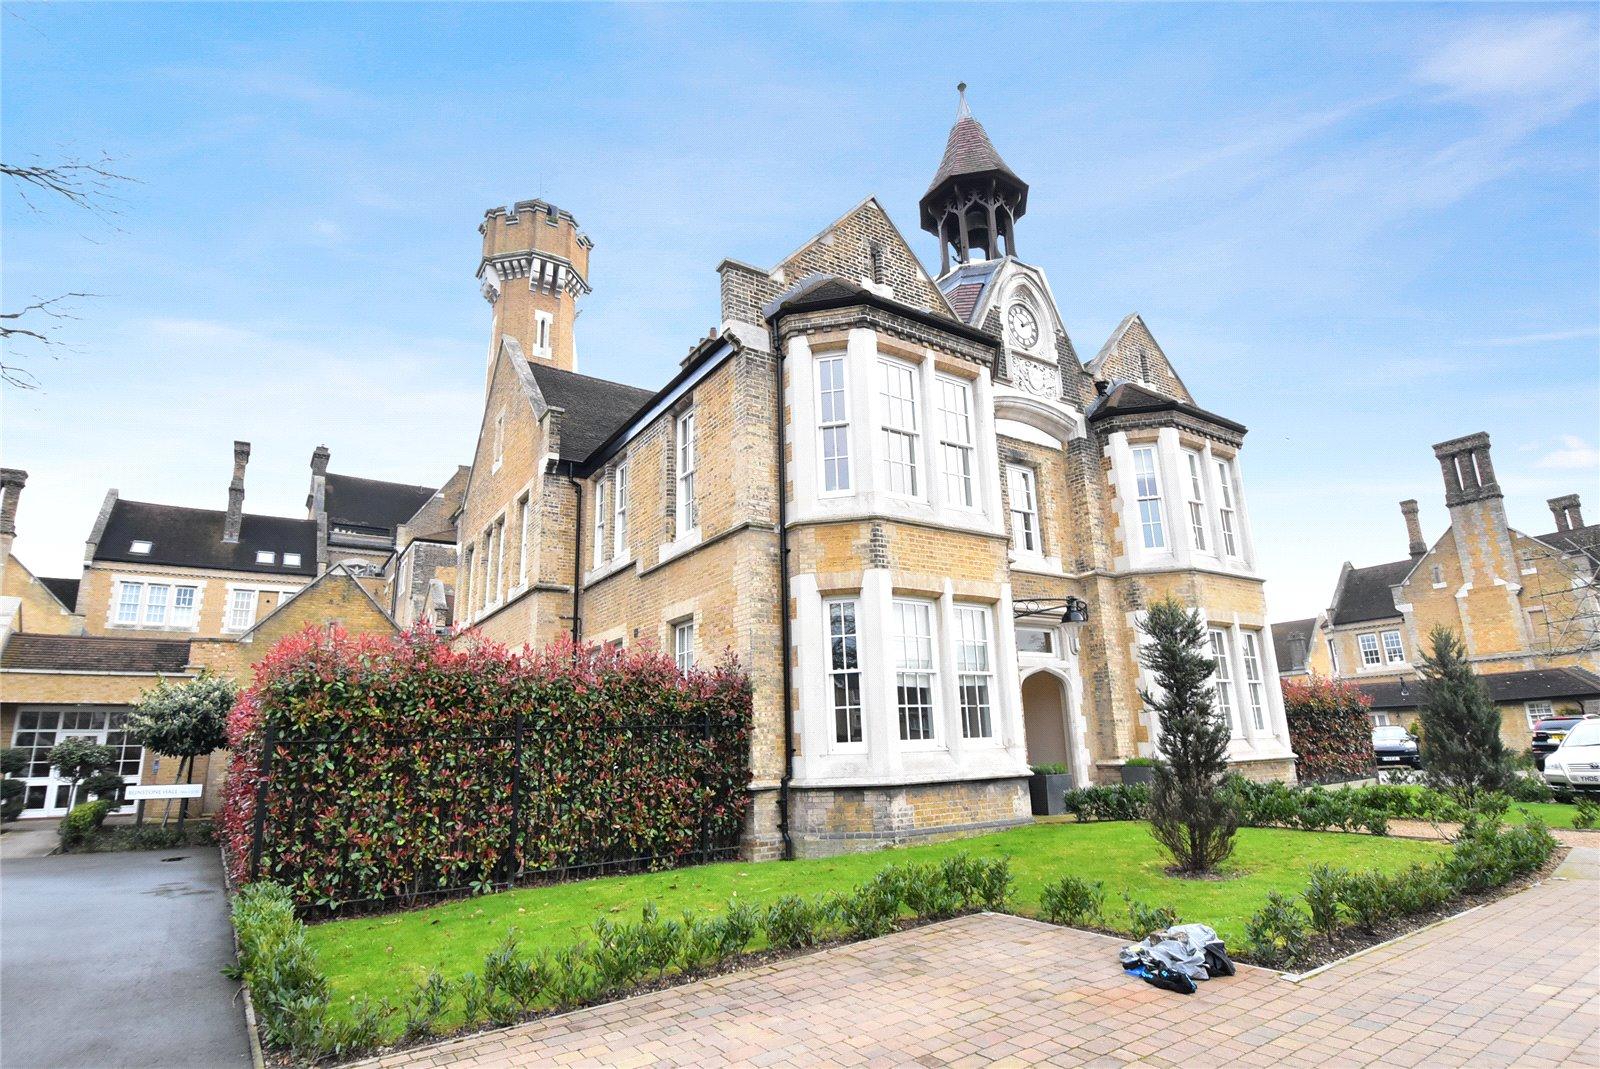 Chapel Drive, The Residence, Dartford, Kent, DA2